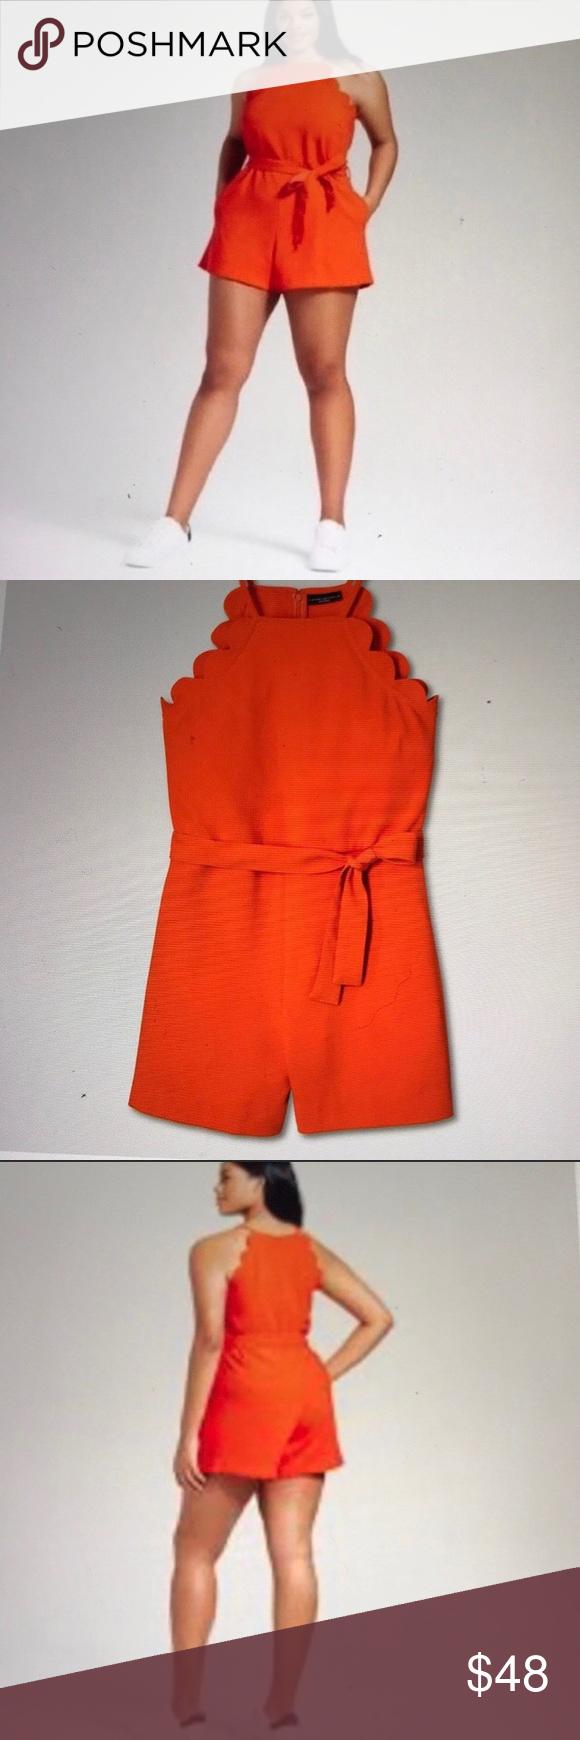 Victoria Beckham For Target Orange Scallop Romper Victoria Beckham Target Fashion Victoria Beckham [ 1740 x 580 Pixel ]